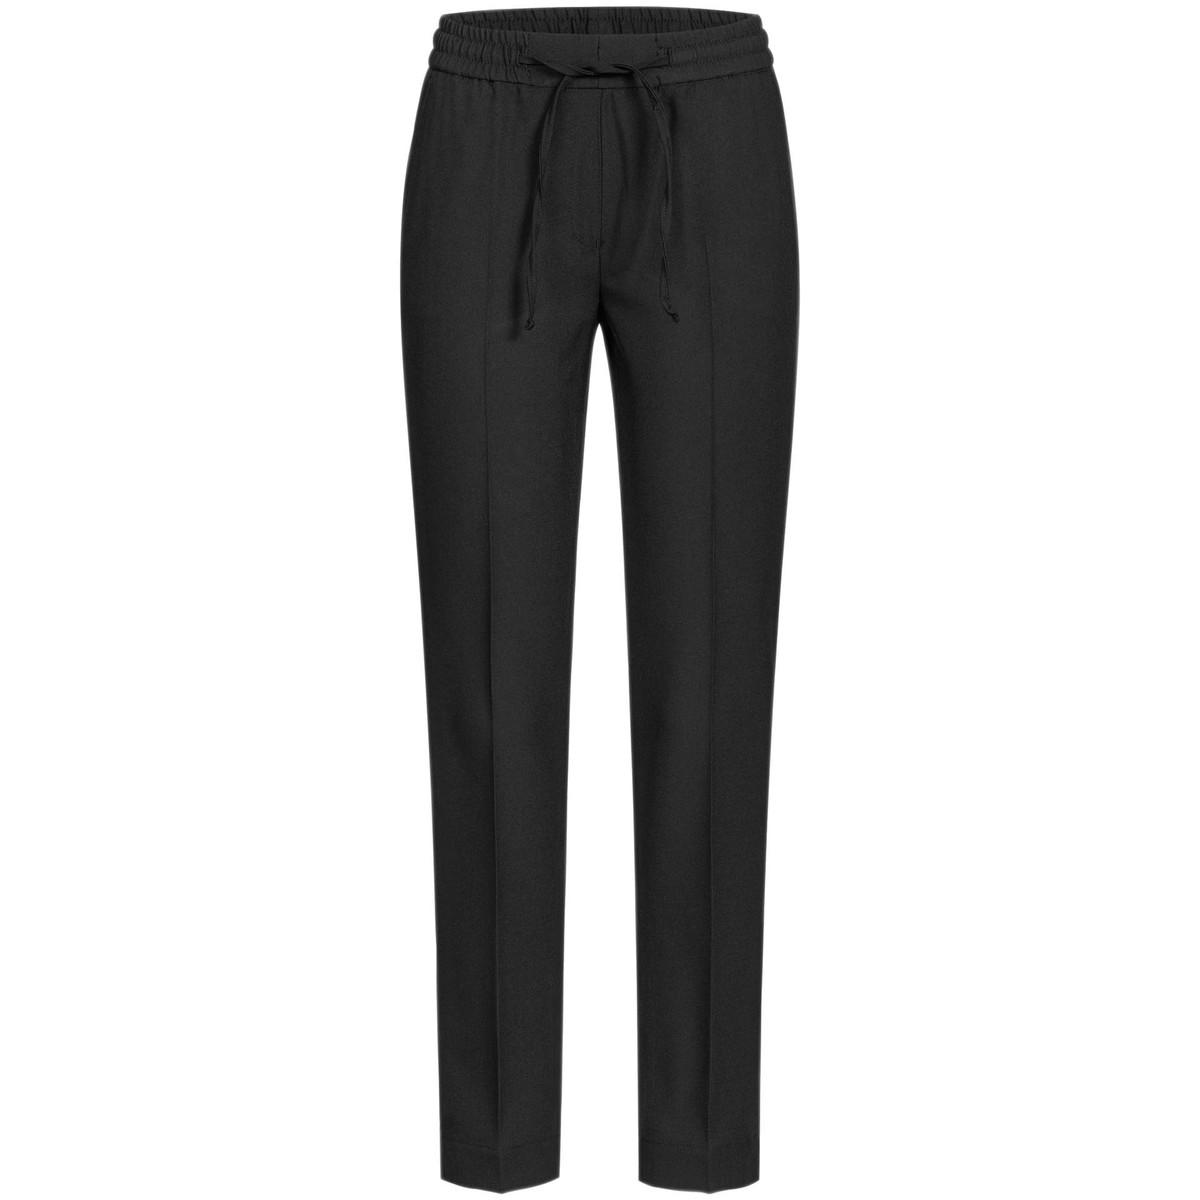 "Damen-Hose ""Joggpants"" schwarz Größe 38"